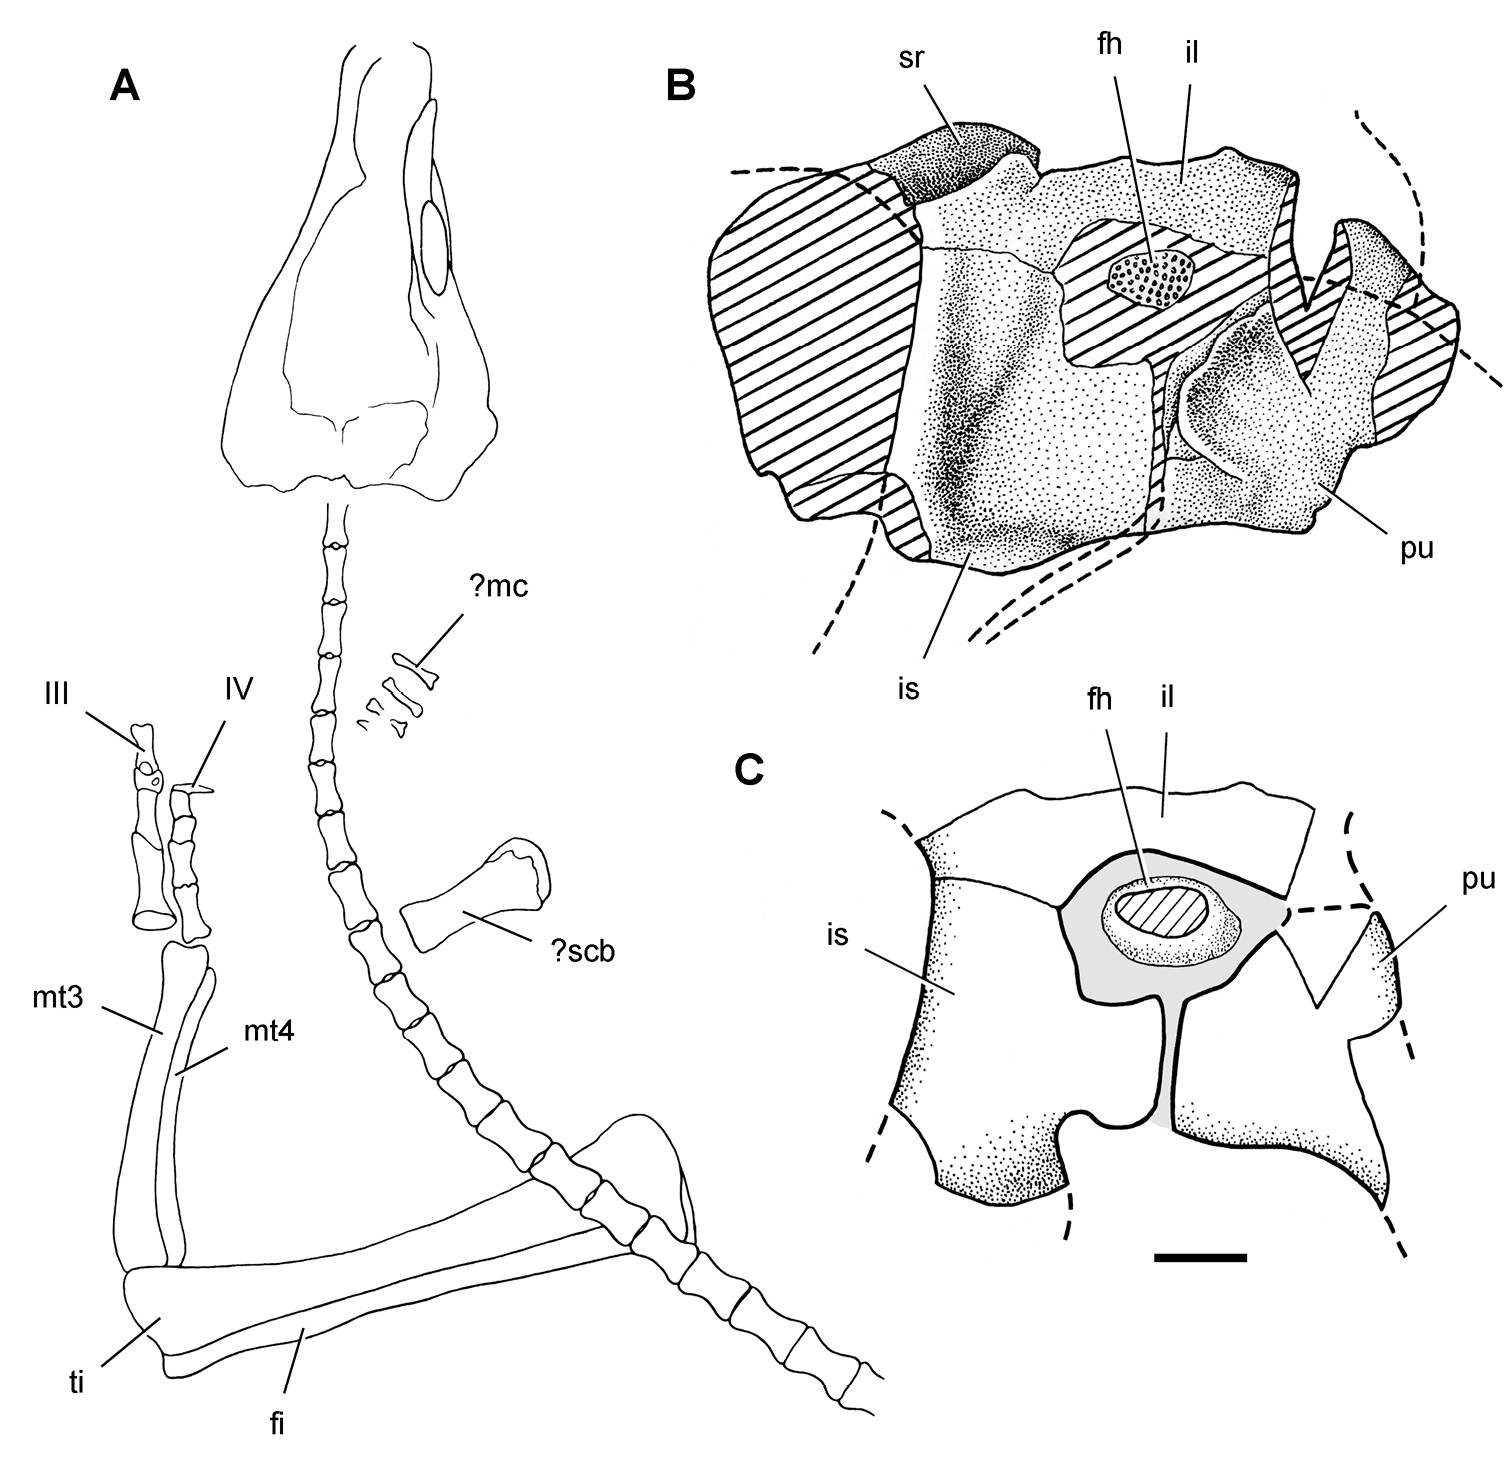 taxonomy morphology masticatory function and phylogeny of